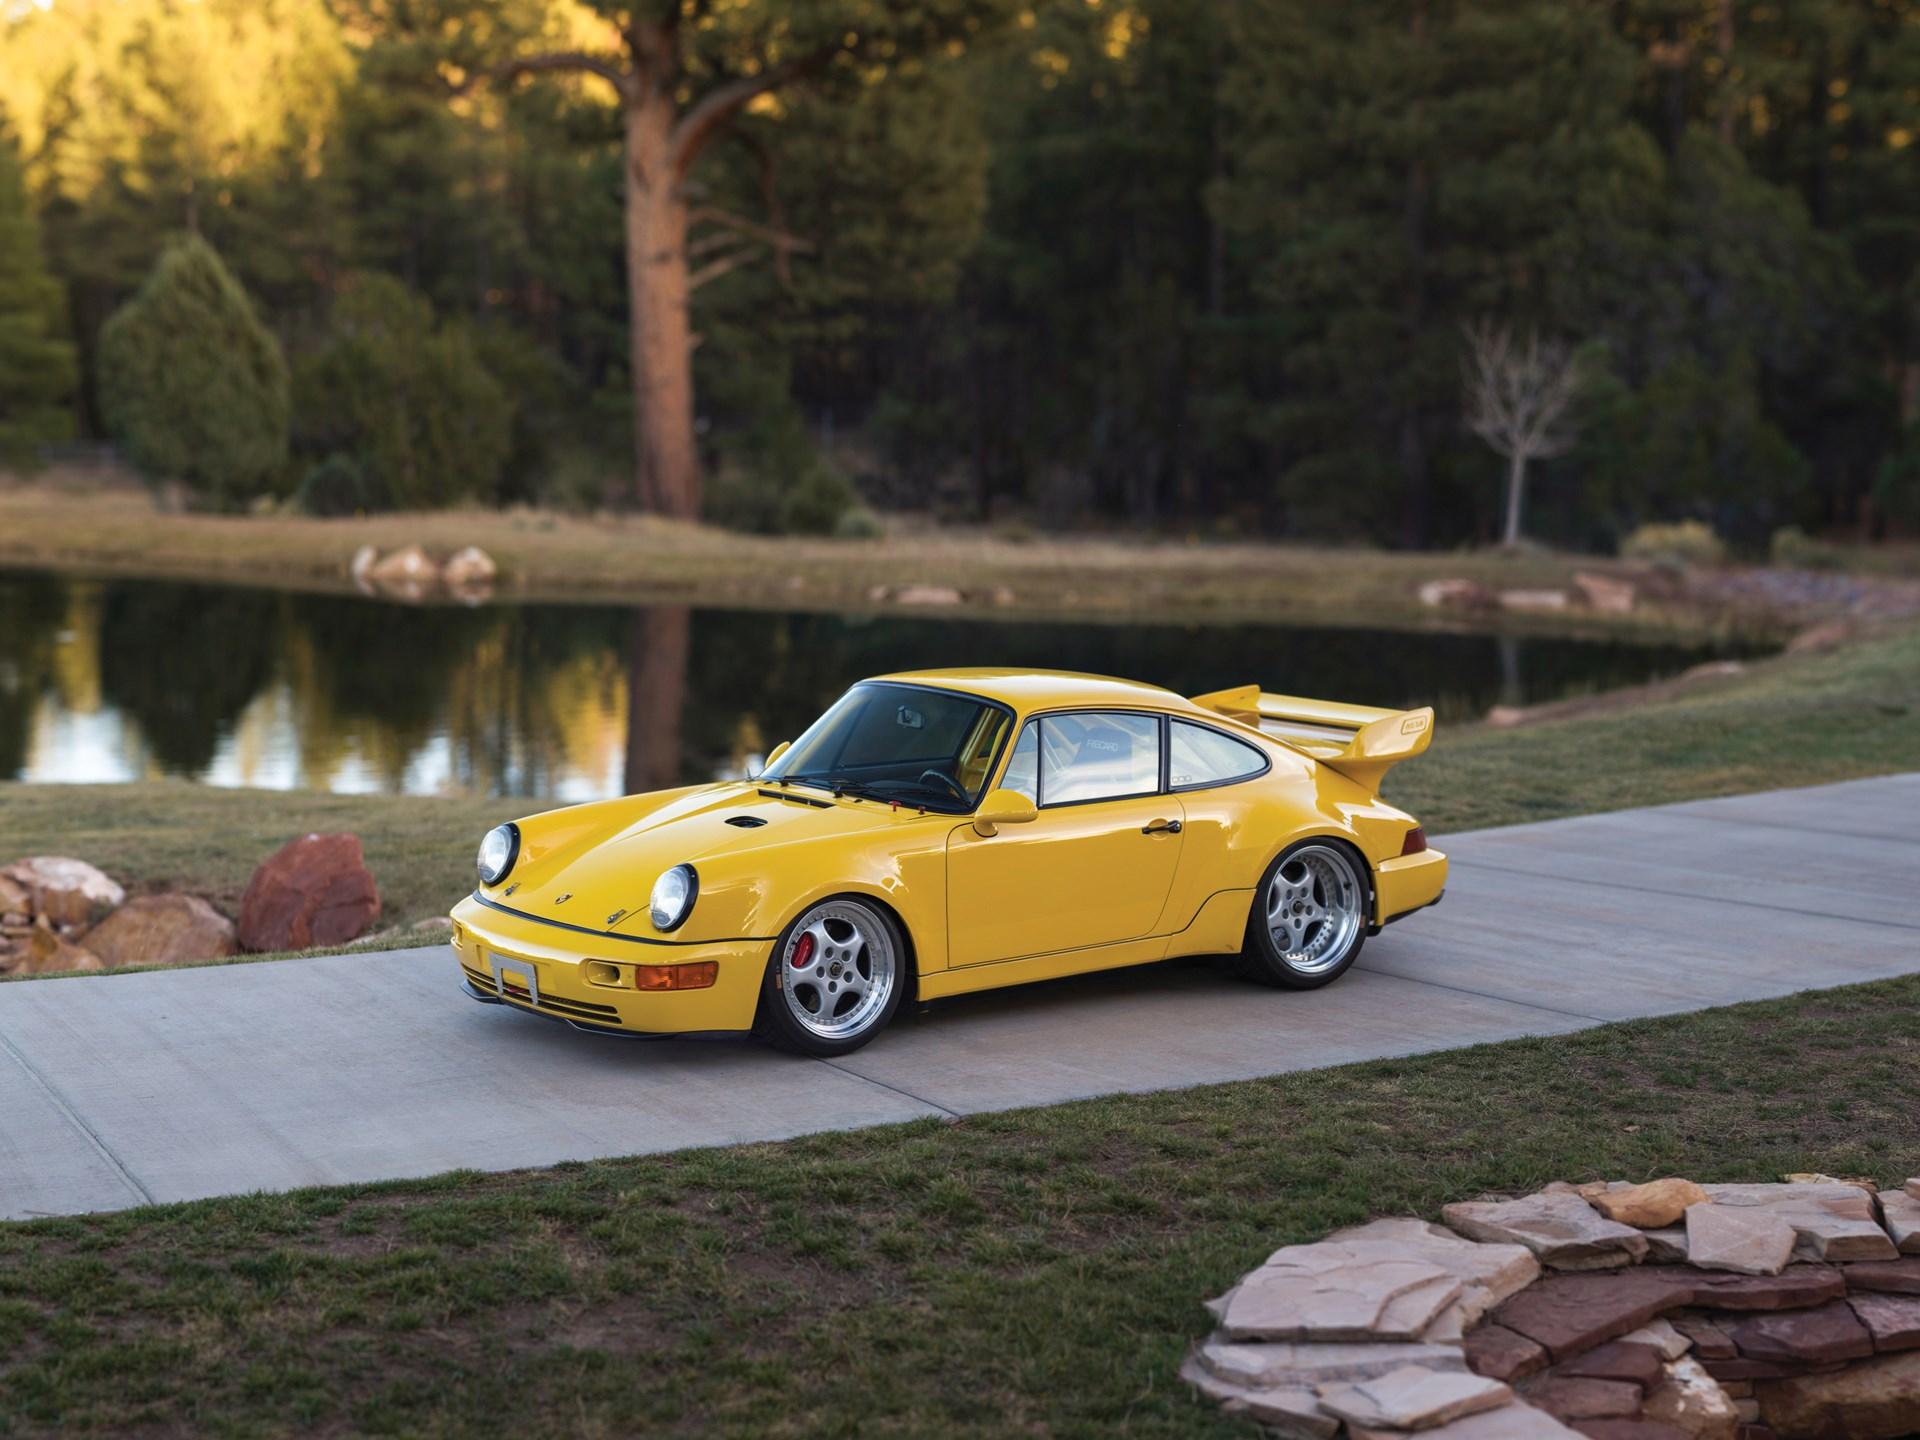 RM Sotheby's - 1993 Porsche 911 Carrera RSR 3 8 | Amelia Island 2018